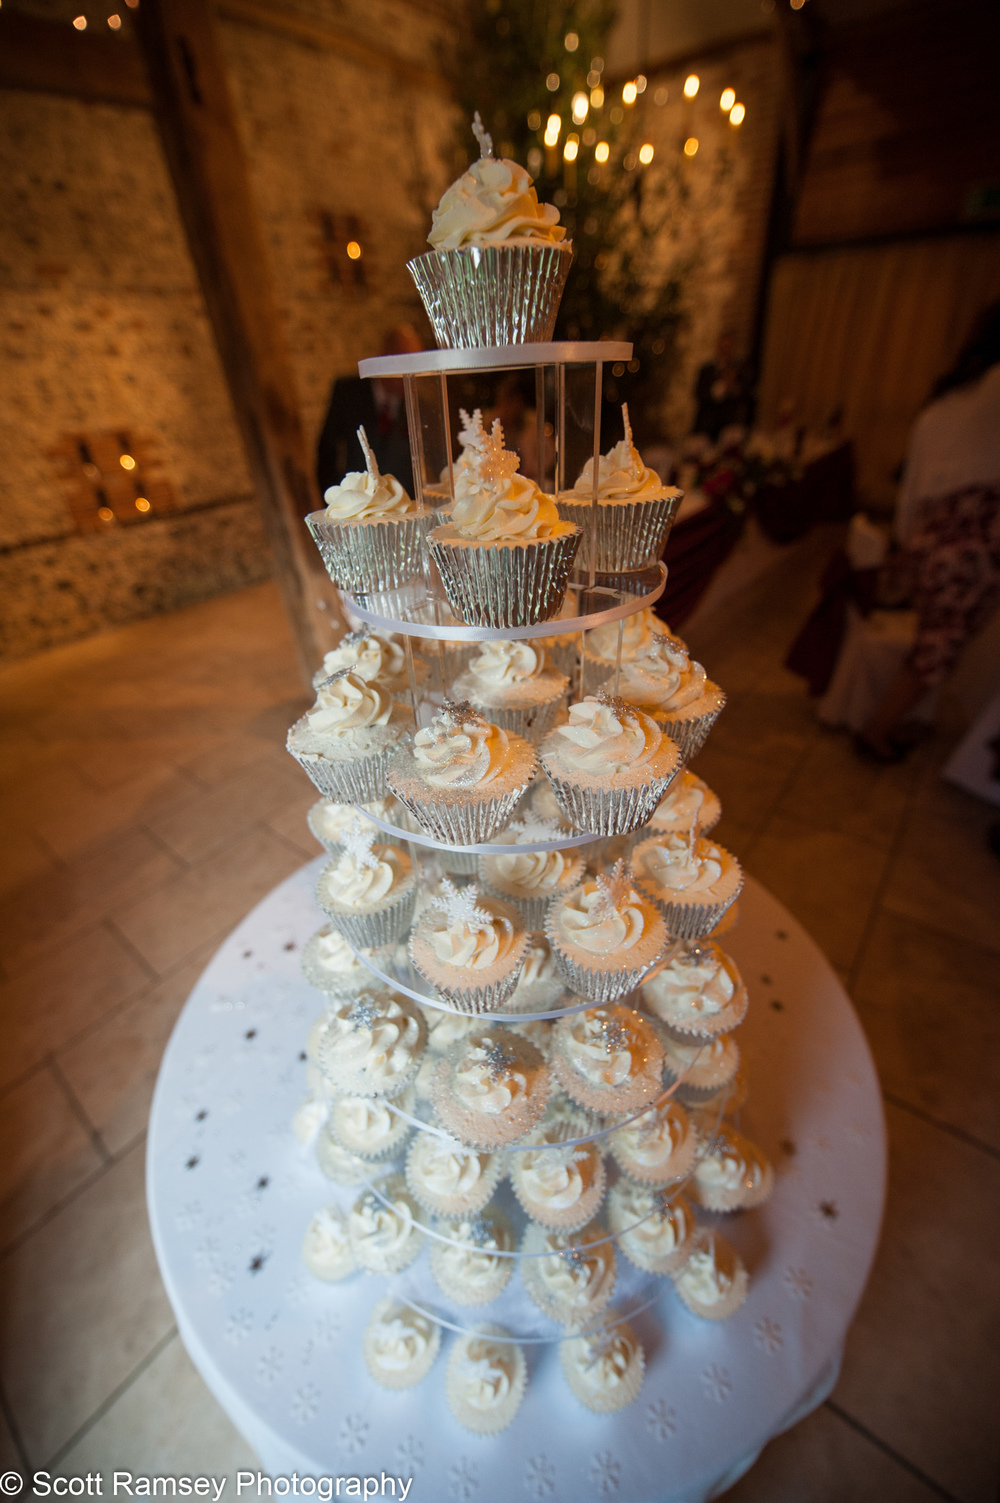 Upwaltham Barns Wedding Cup Cakes 15121234